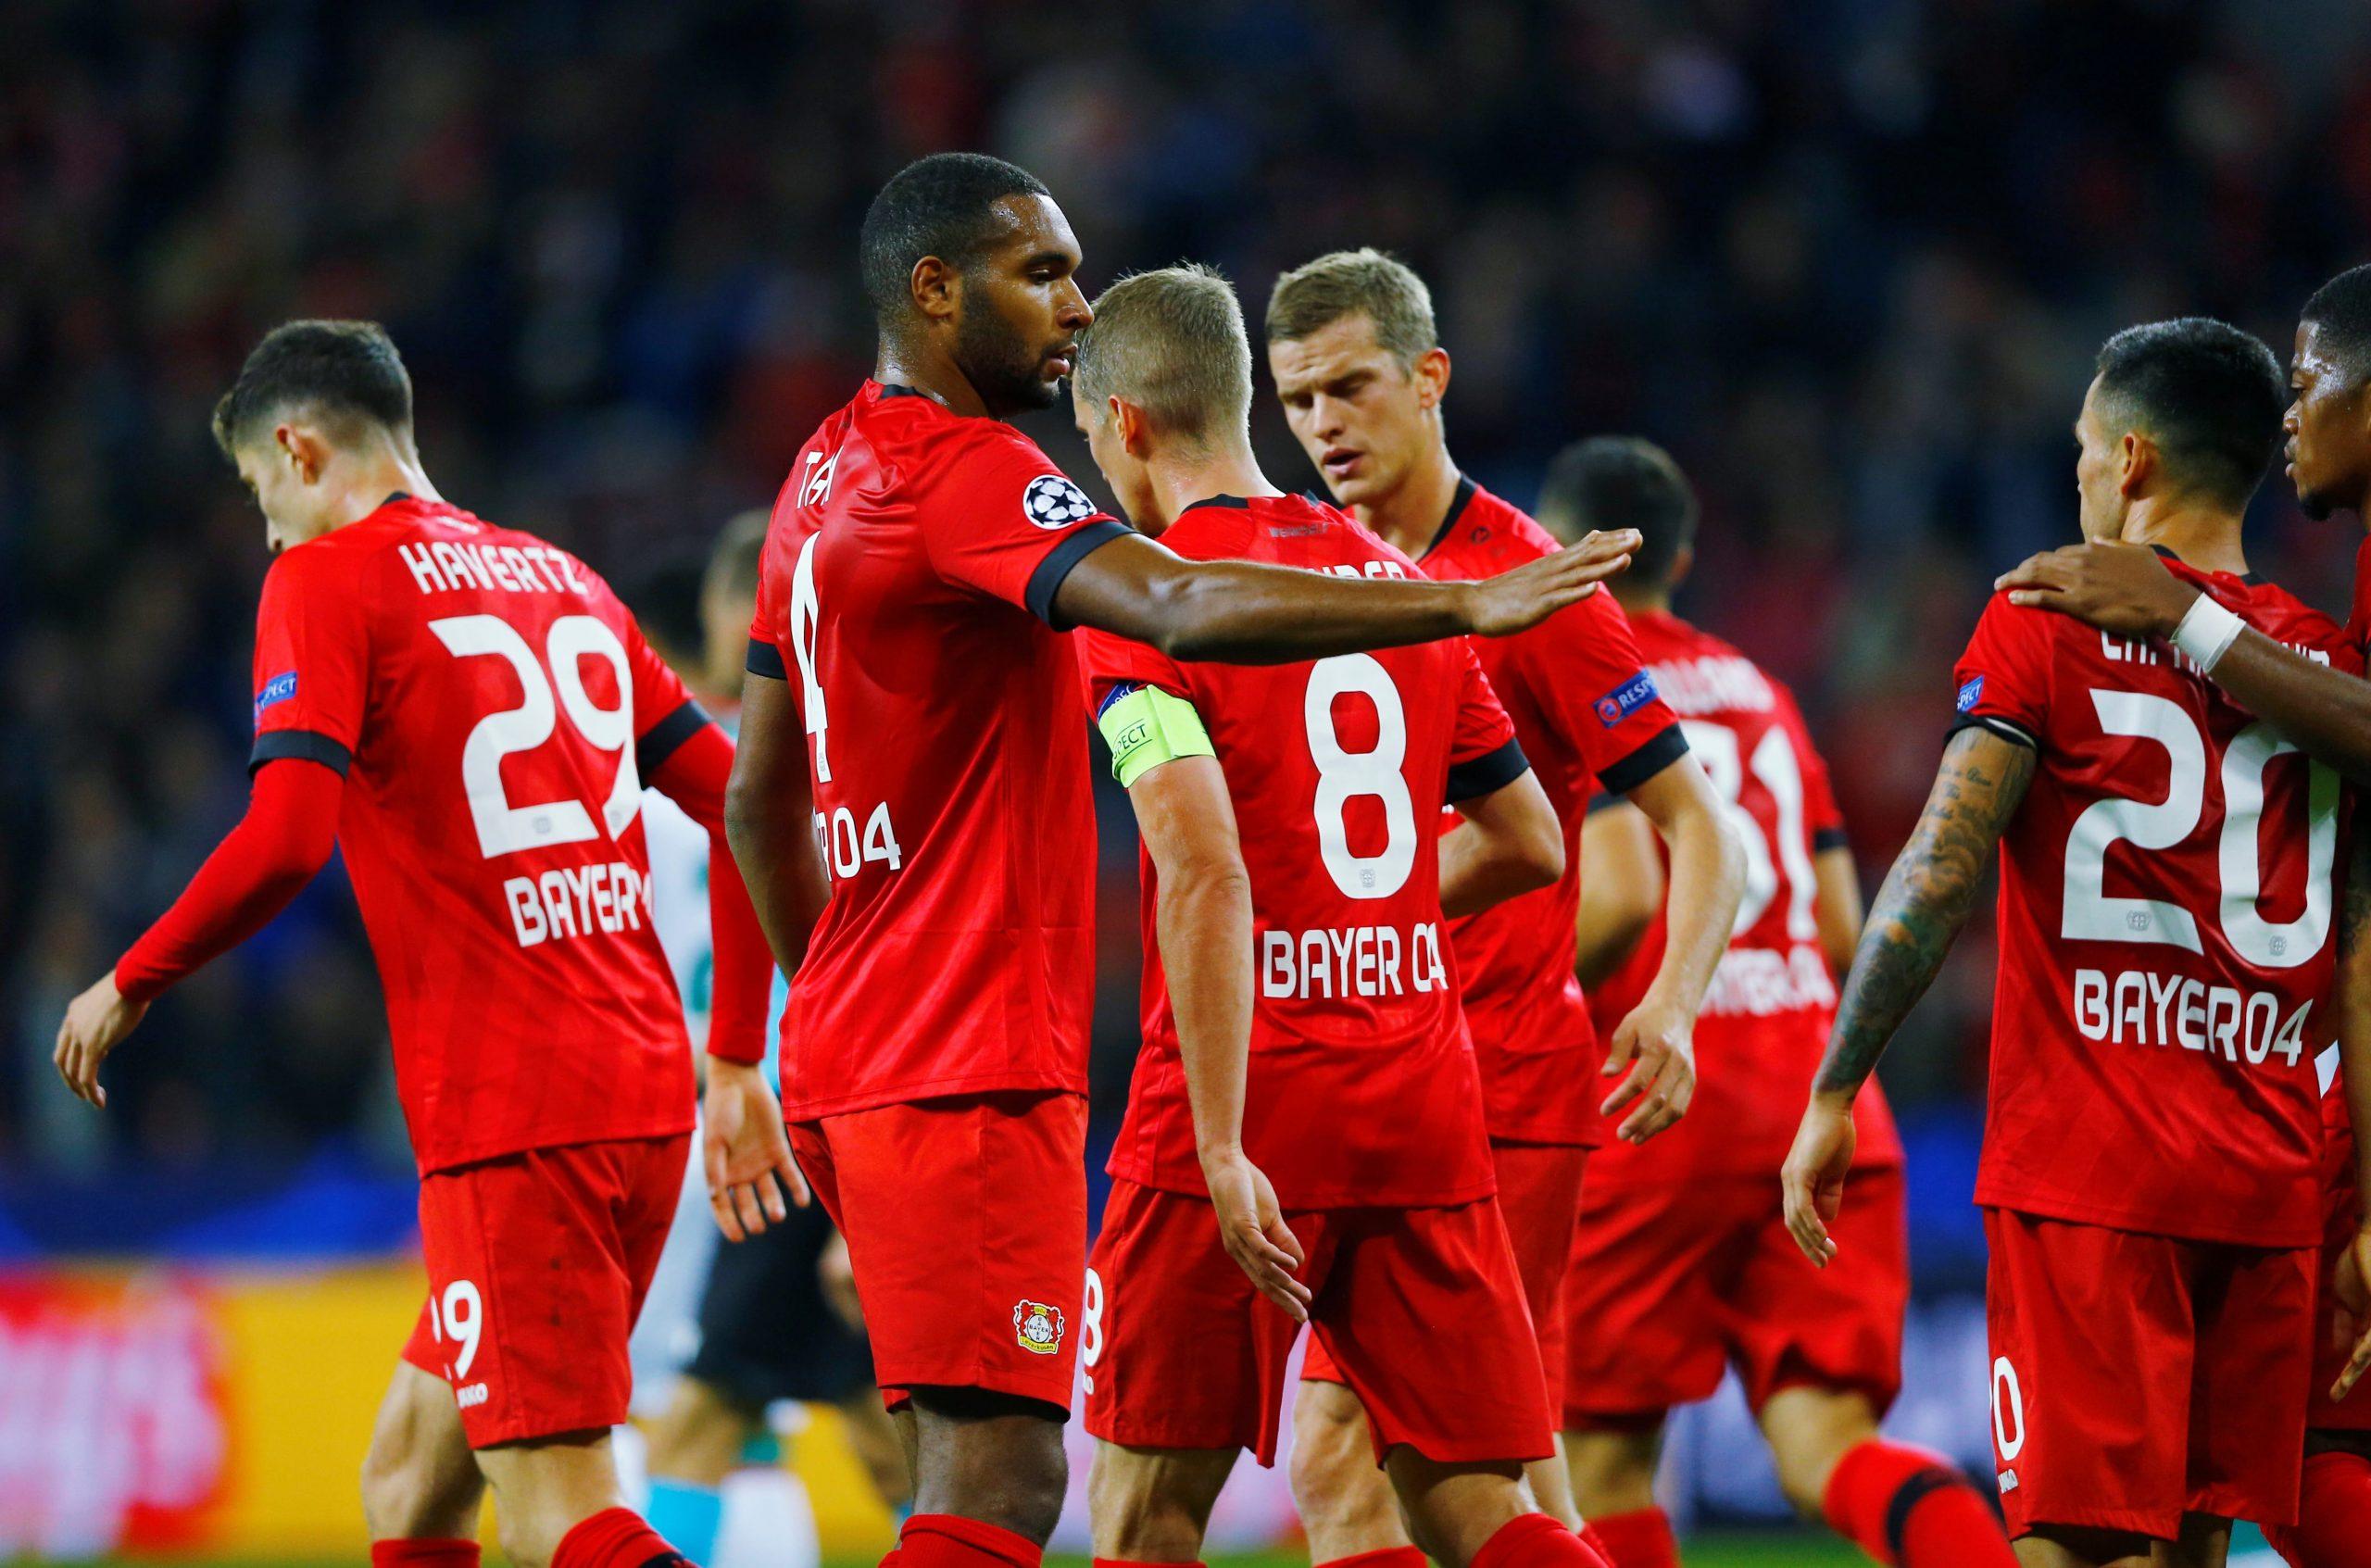 Inter Milan vs Bayer Leverkusen Live Stream, Betting, TV, Preview & News